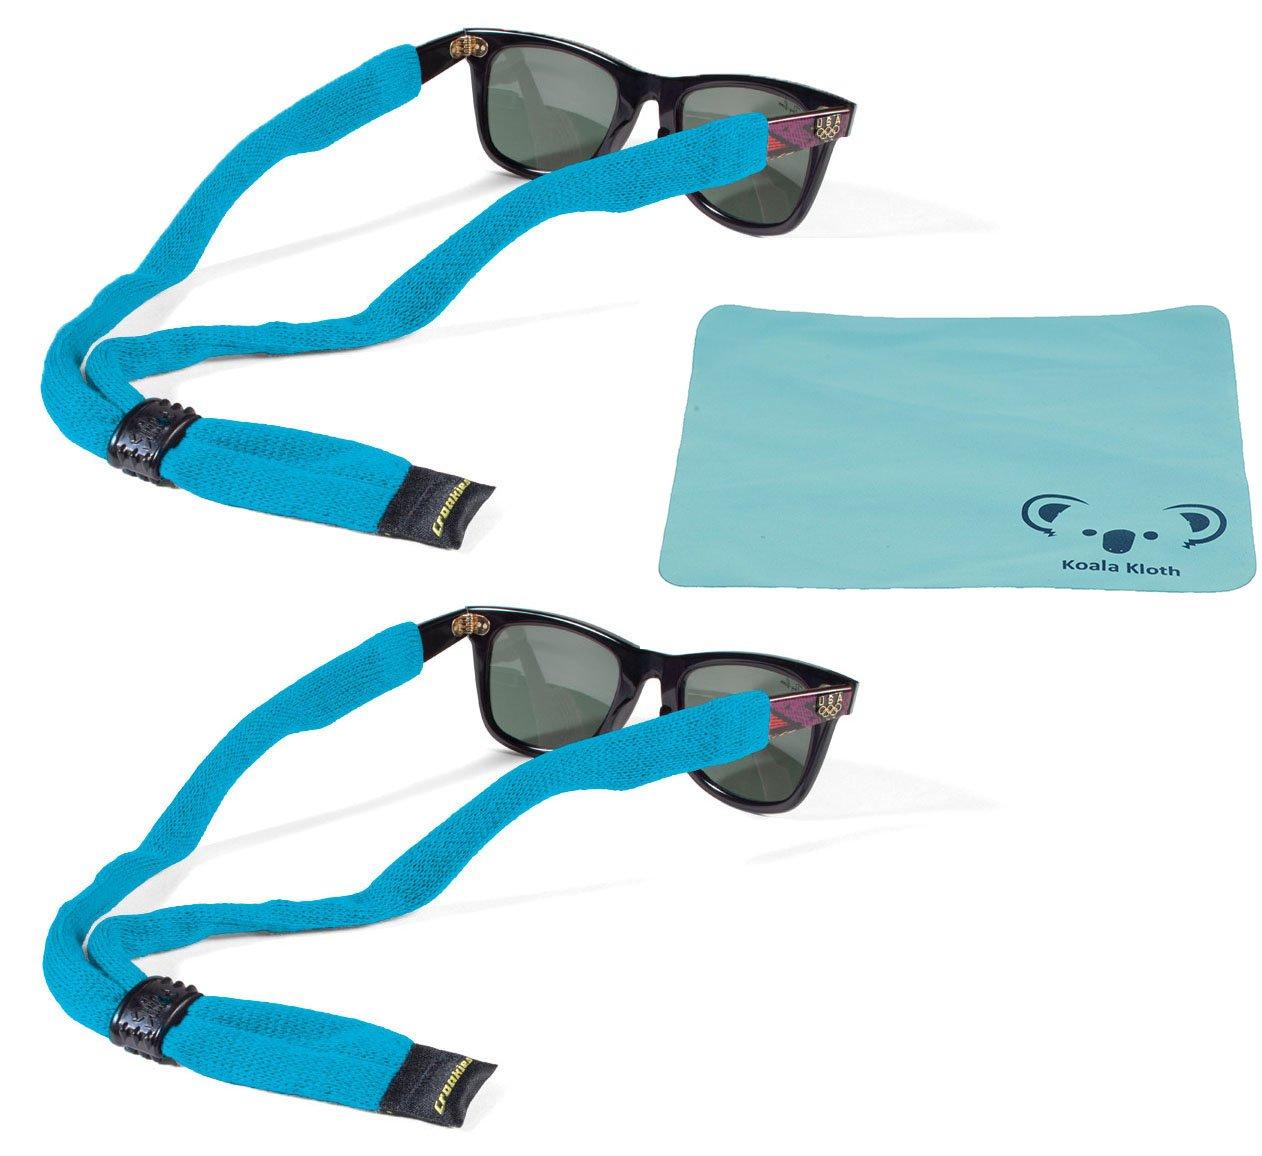 27cad4977ca Get Quotations · Croakies Cotton Suiters Eyewear Retainer Sunglass   Eyeglass  Strap